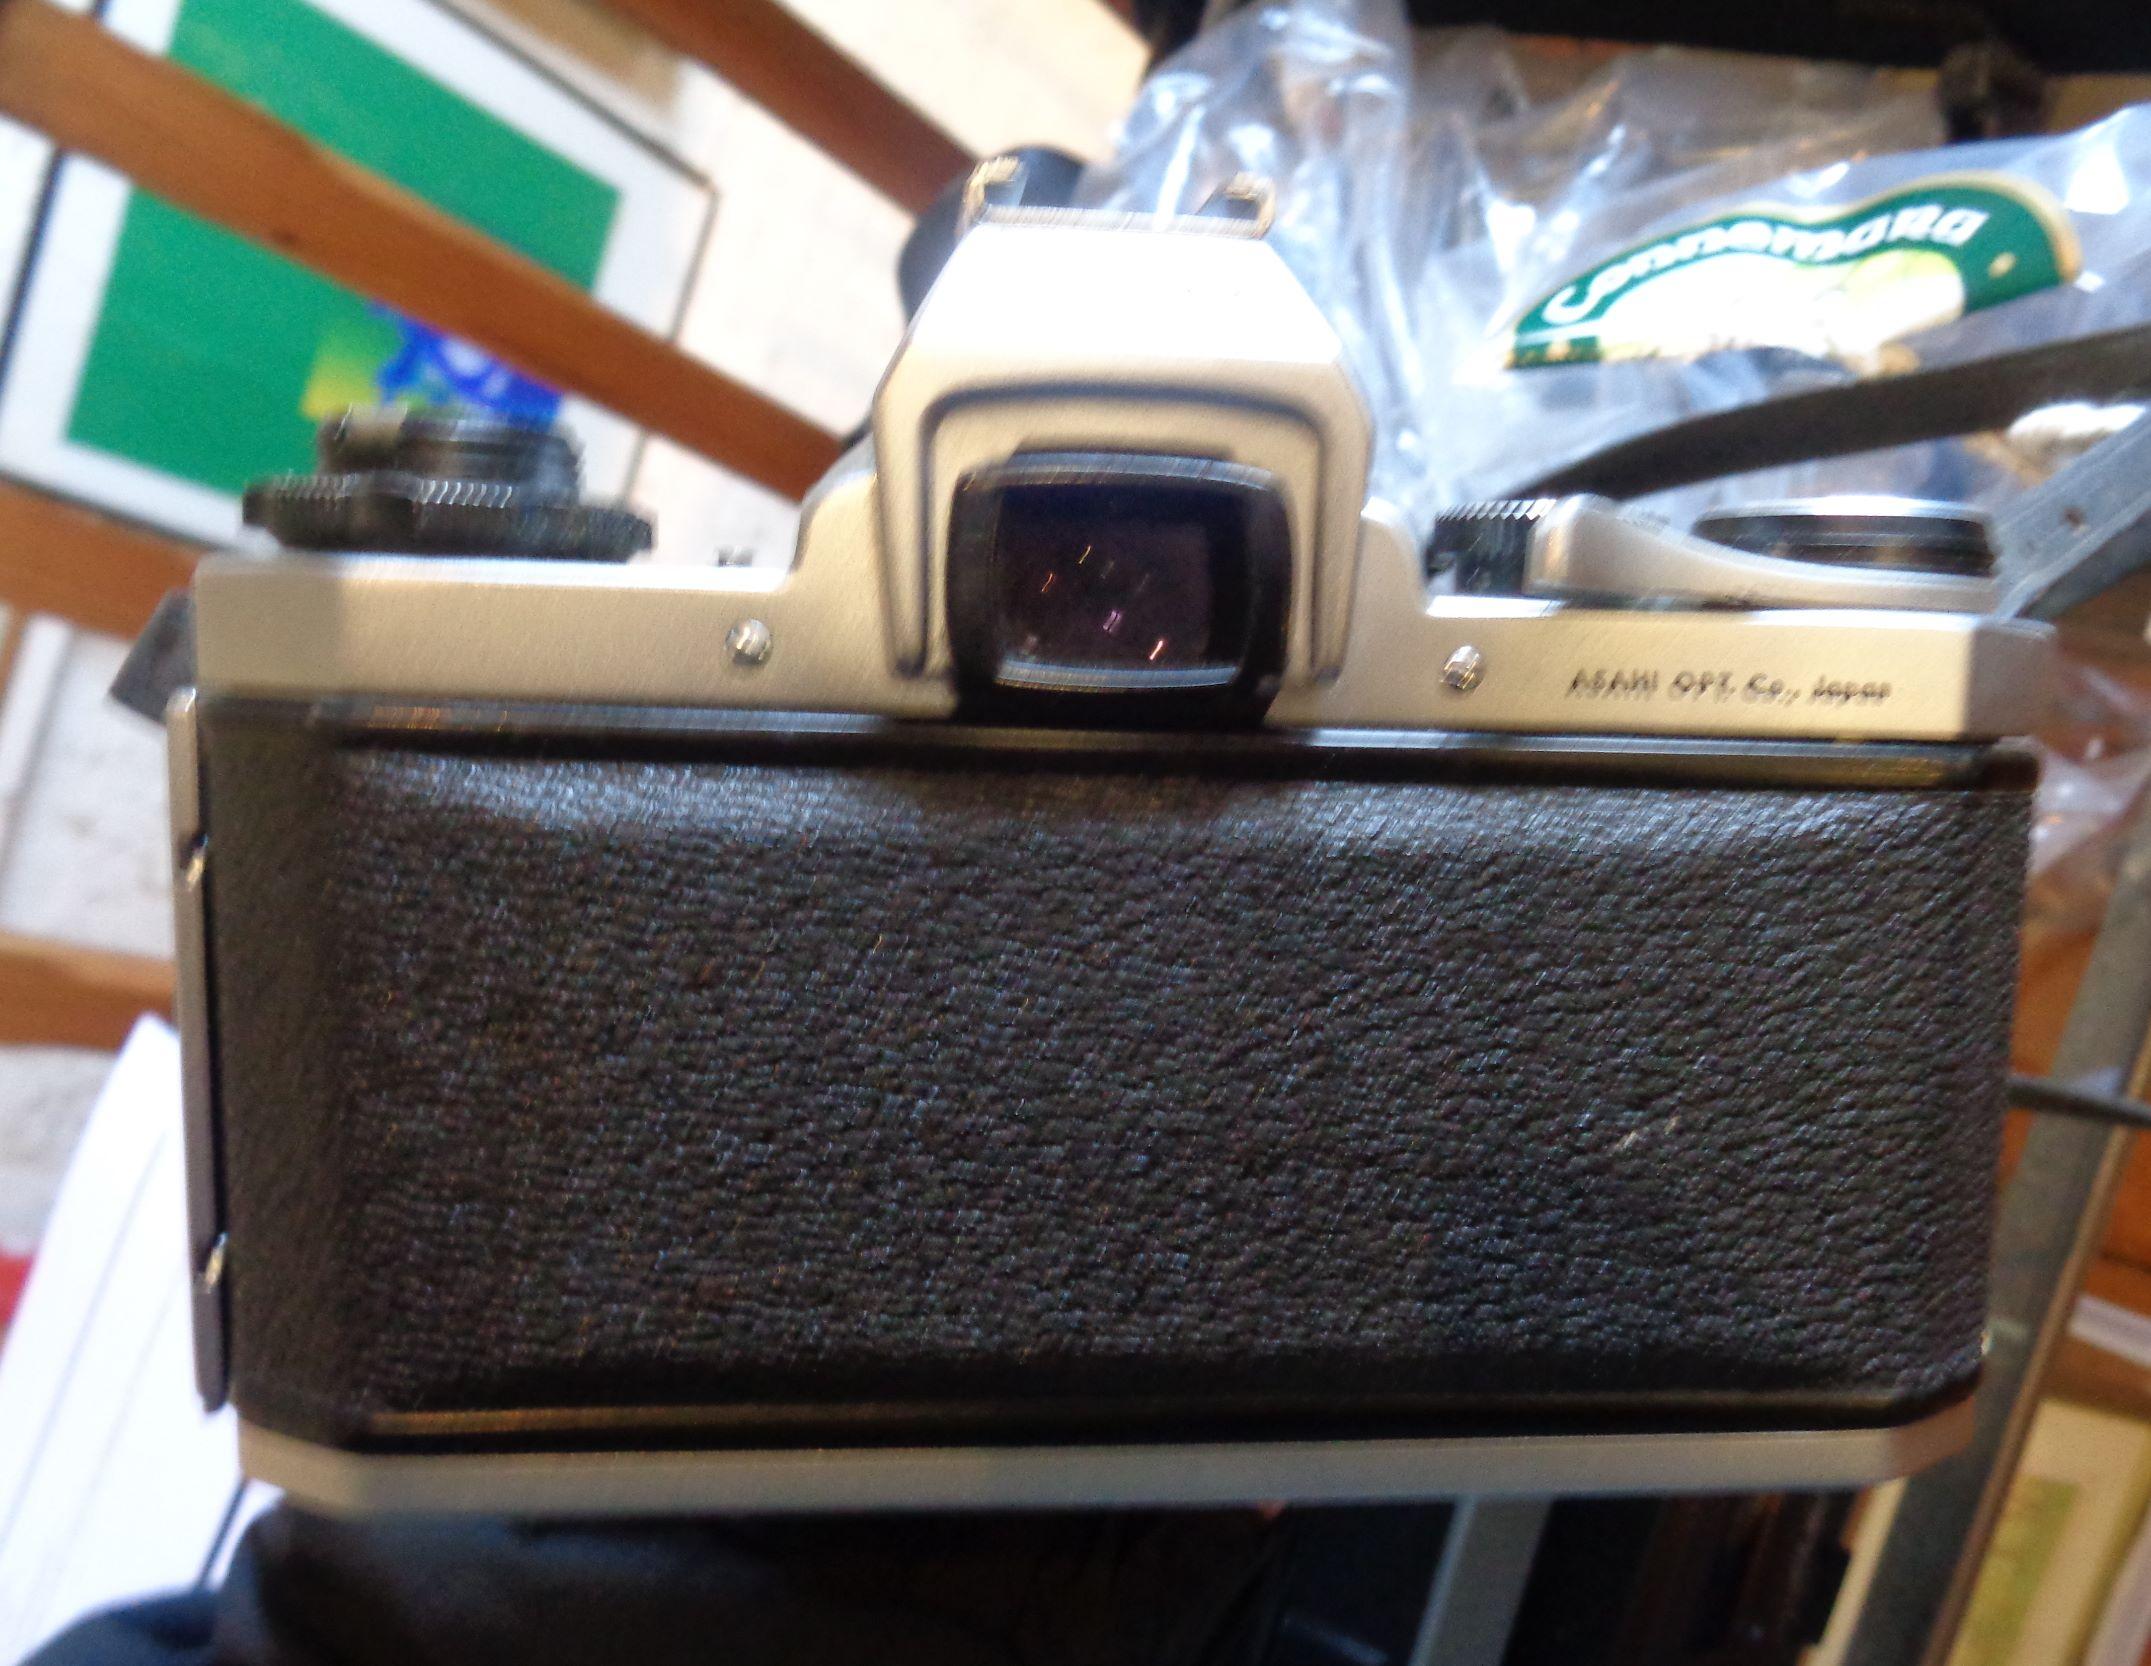 Lot 3 - Pentax SV camera no.879597, a lens and an Olympus PEN-D camera